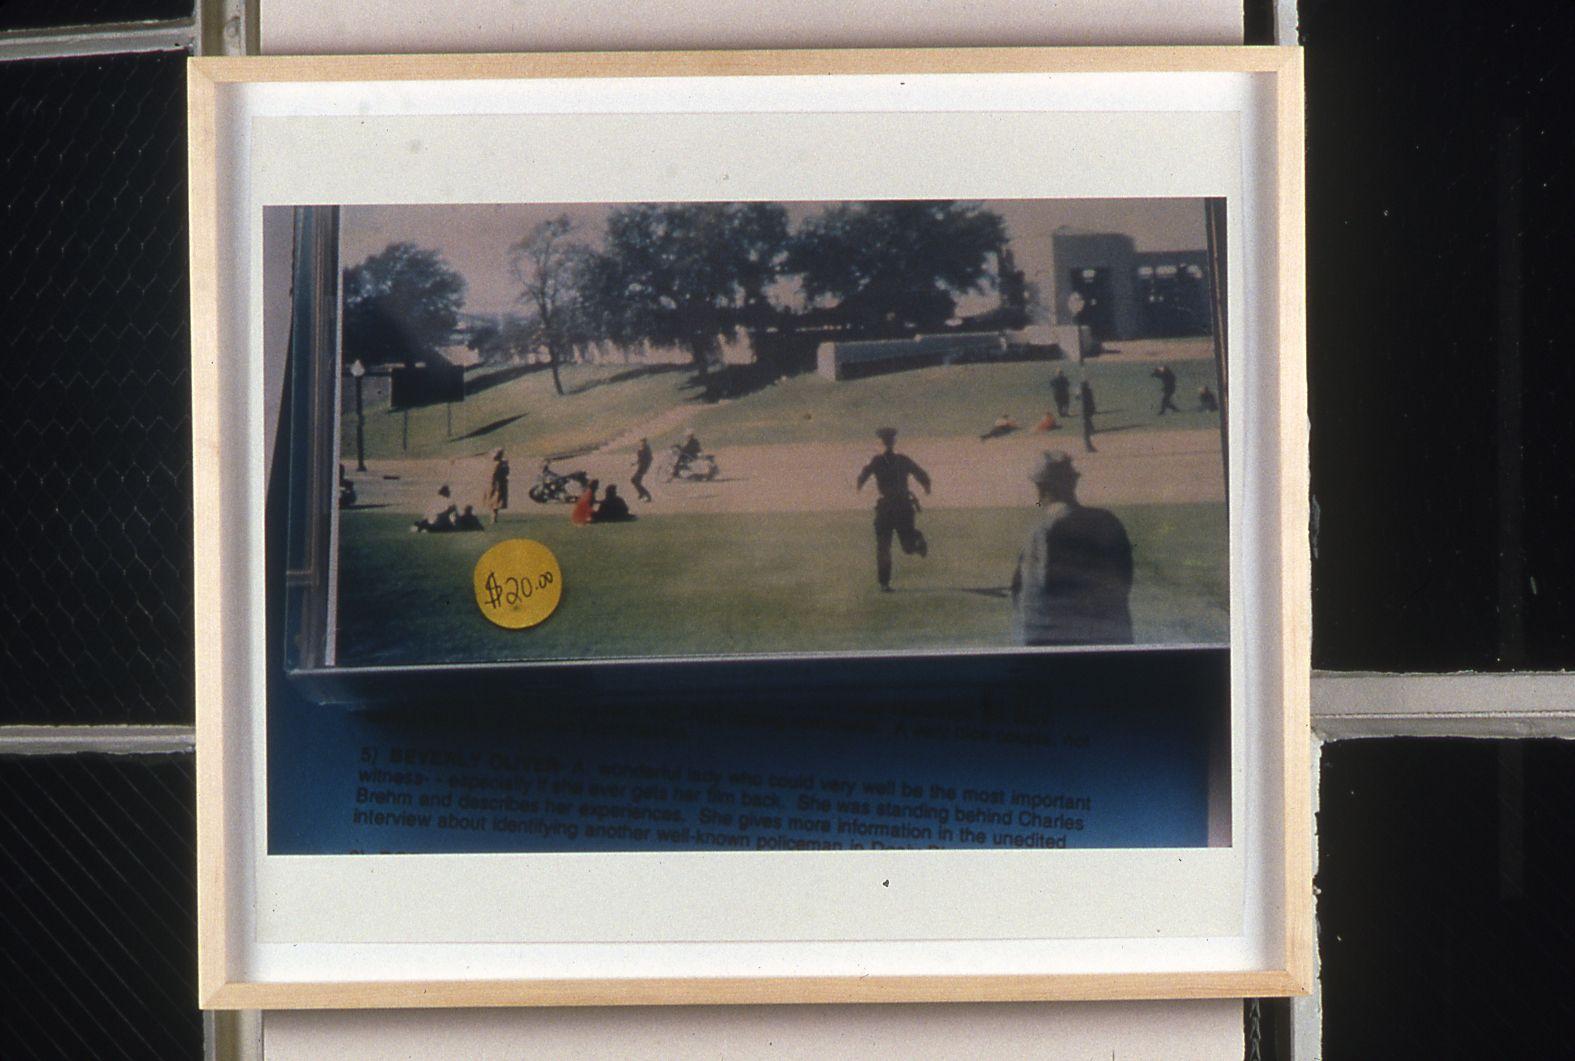 $20, 1996 Chromogenic print, 15 1/2 x 23 inches